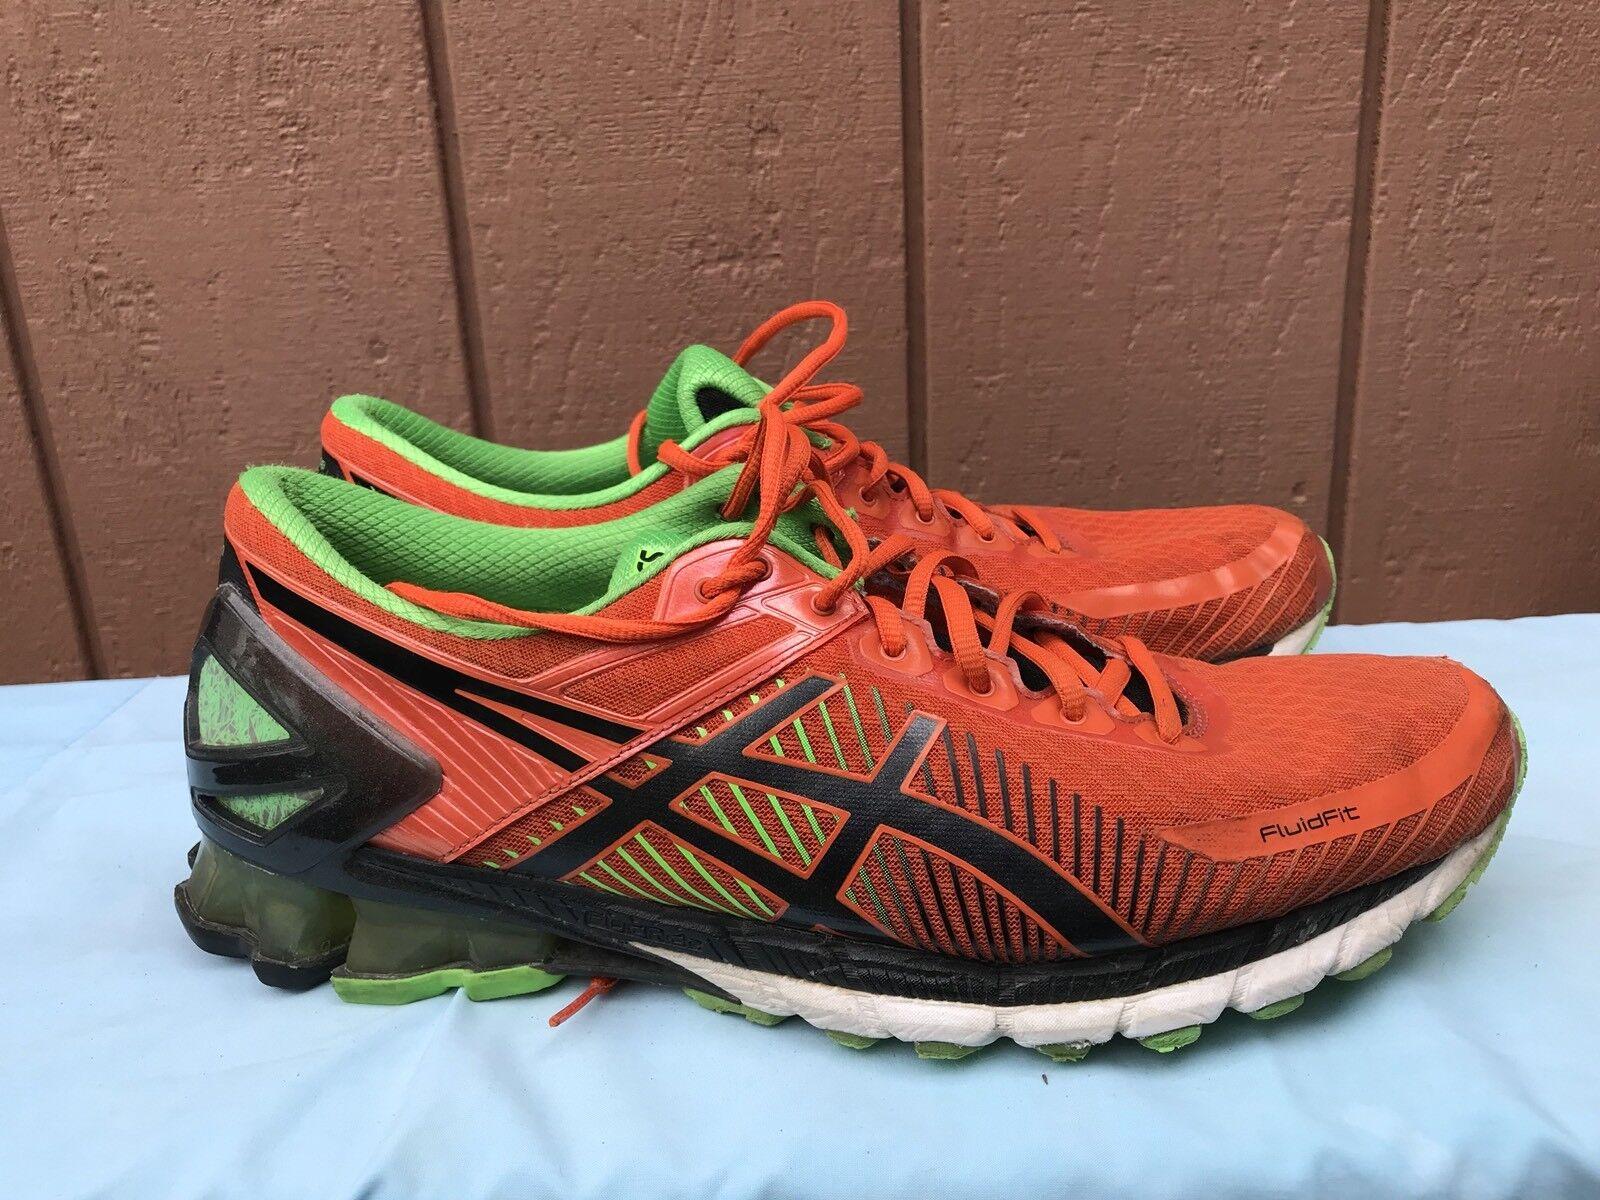 Asic uomini 'gel kinsei 6 scarpa da corsa, verde fiesta / nero / verde corsa, gecko 13 milioni di noi) 656373